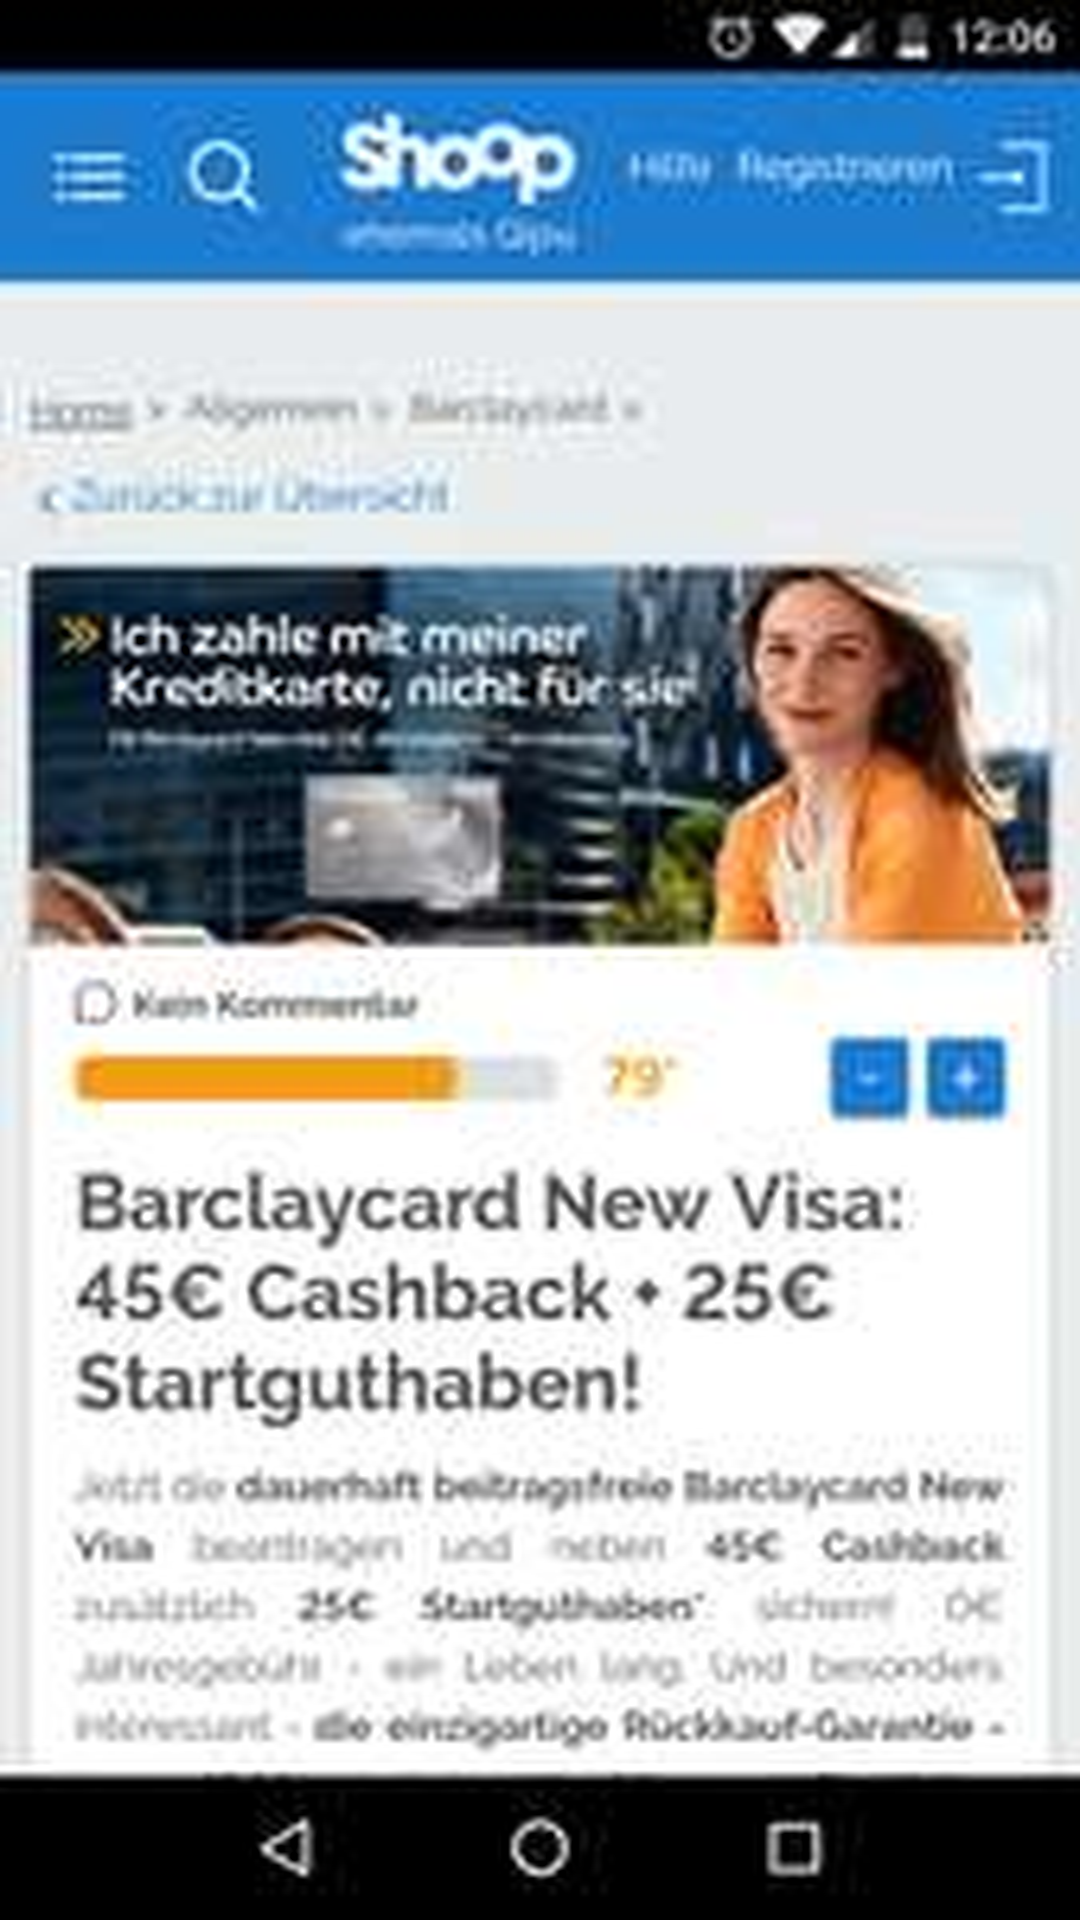 Shoop: Barclaycard New Visa: 45€ Cashback + 25€ Startguthaben!